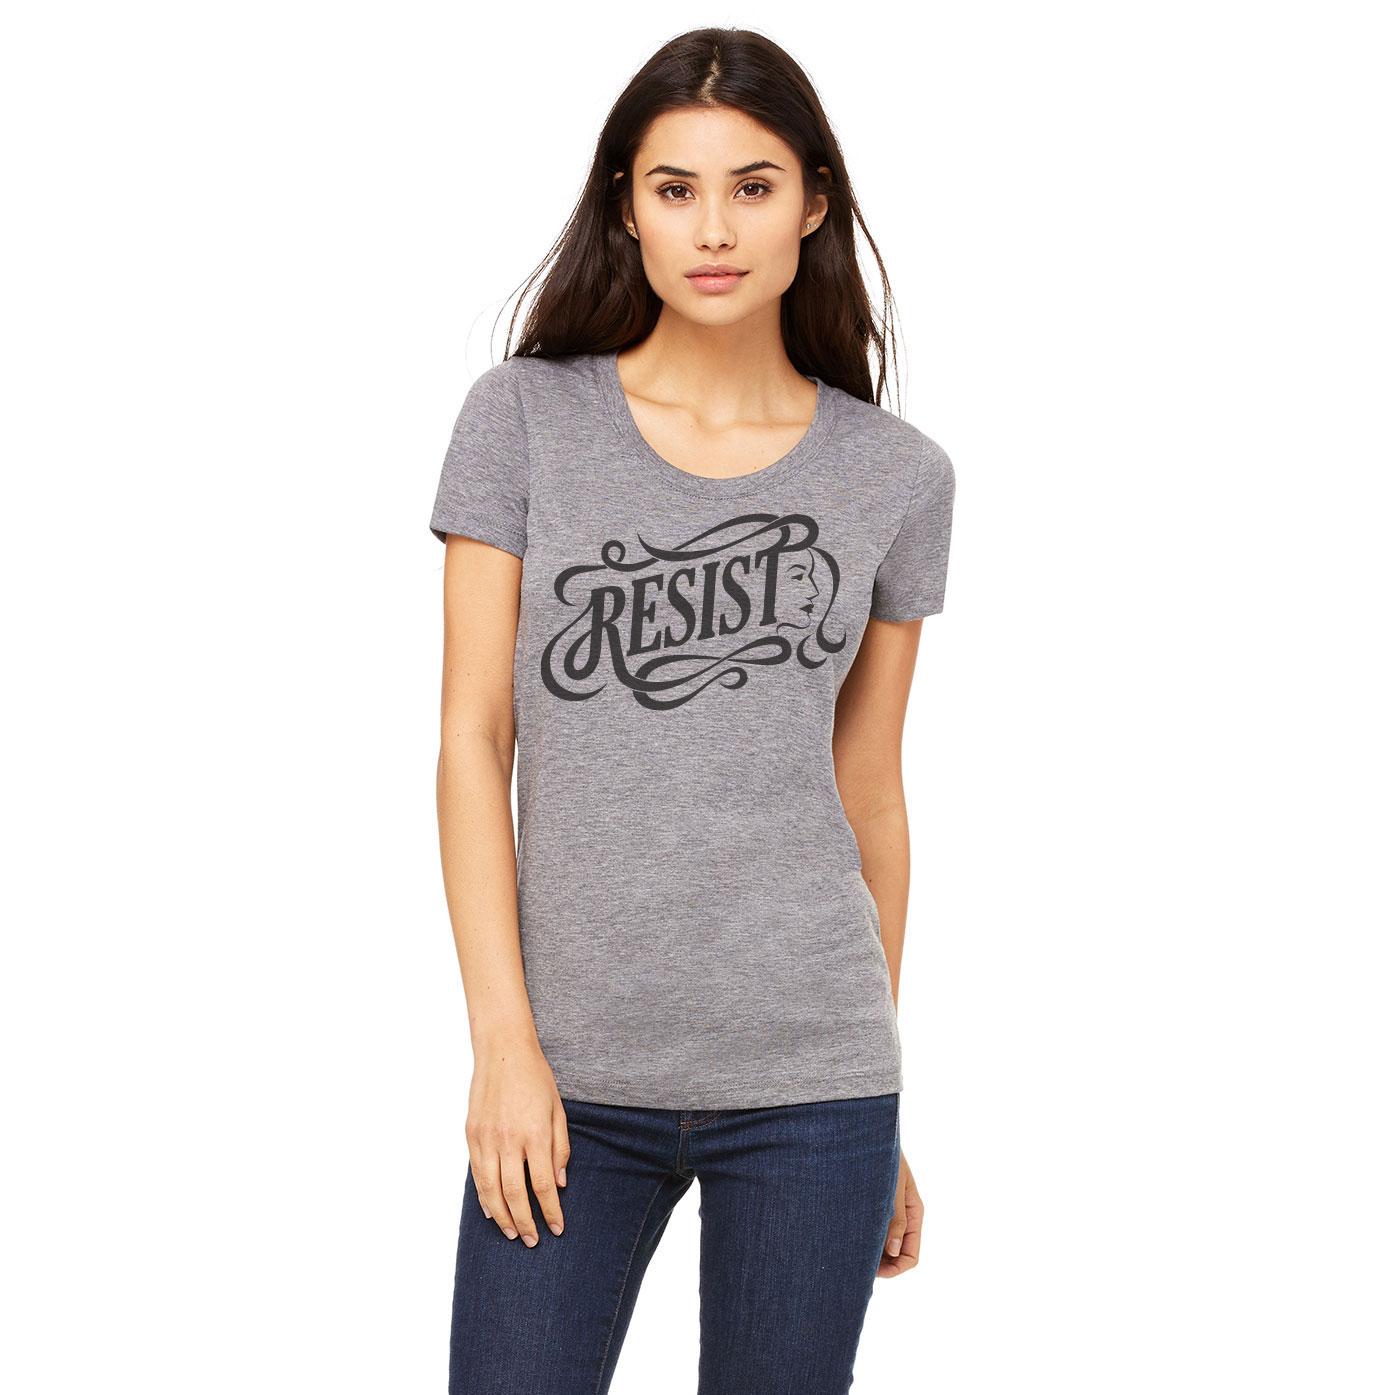 Resist logo t-shirt designed by Ashley Lewis